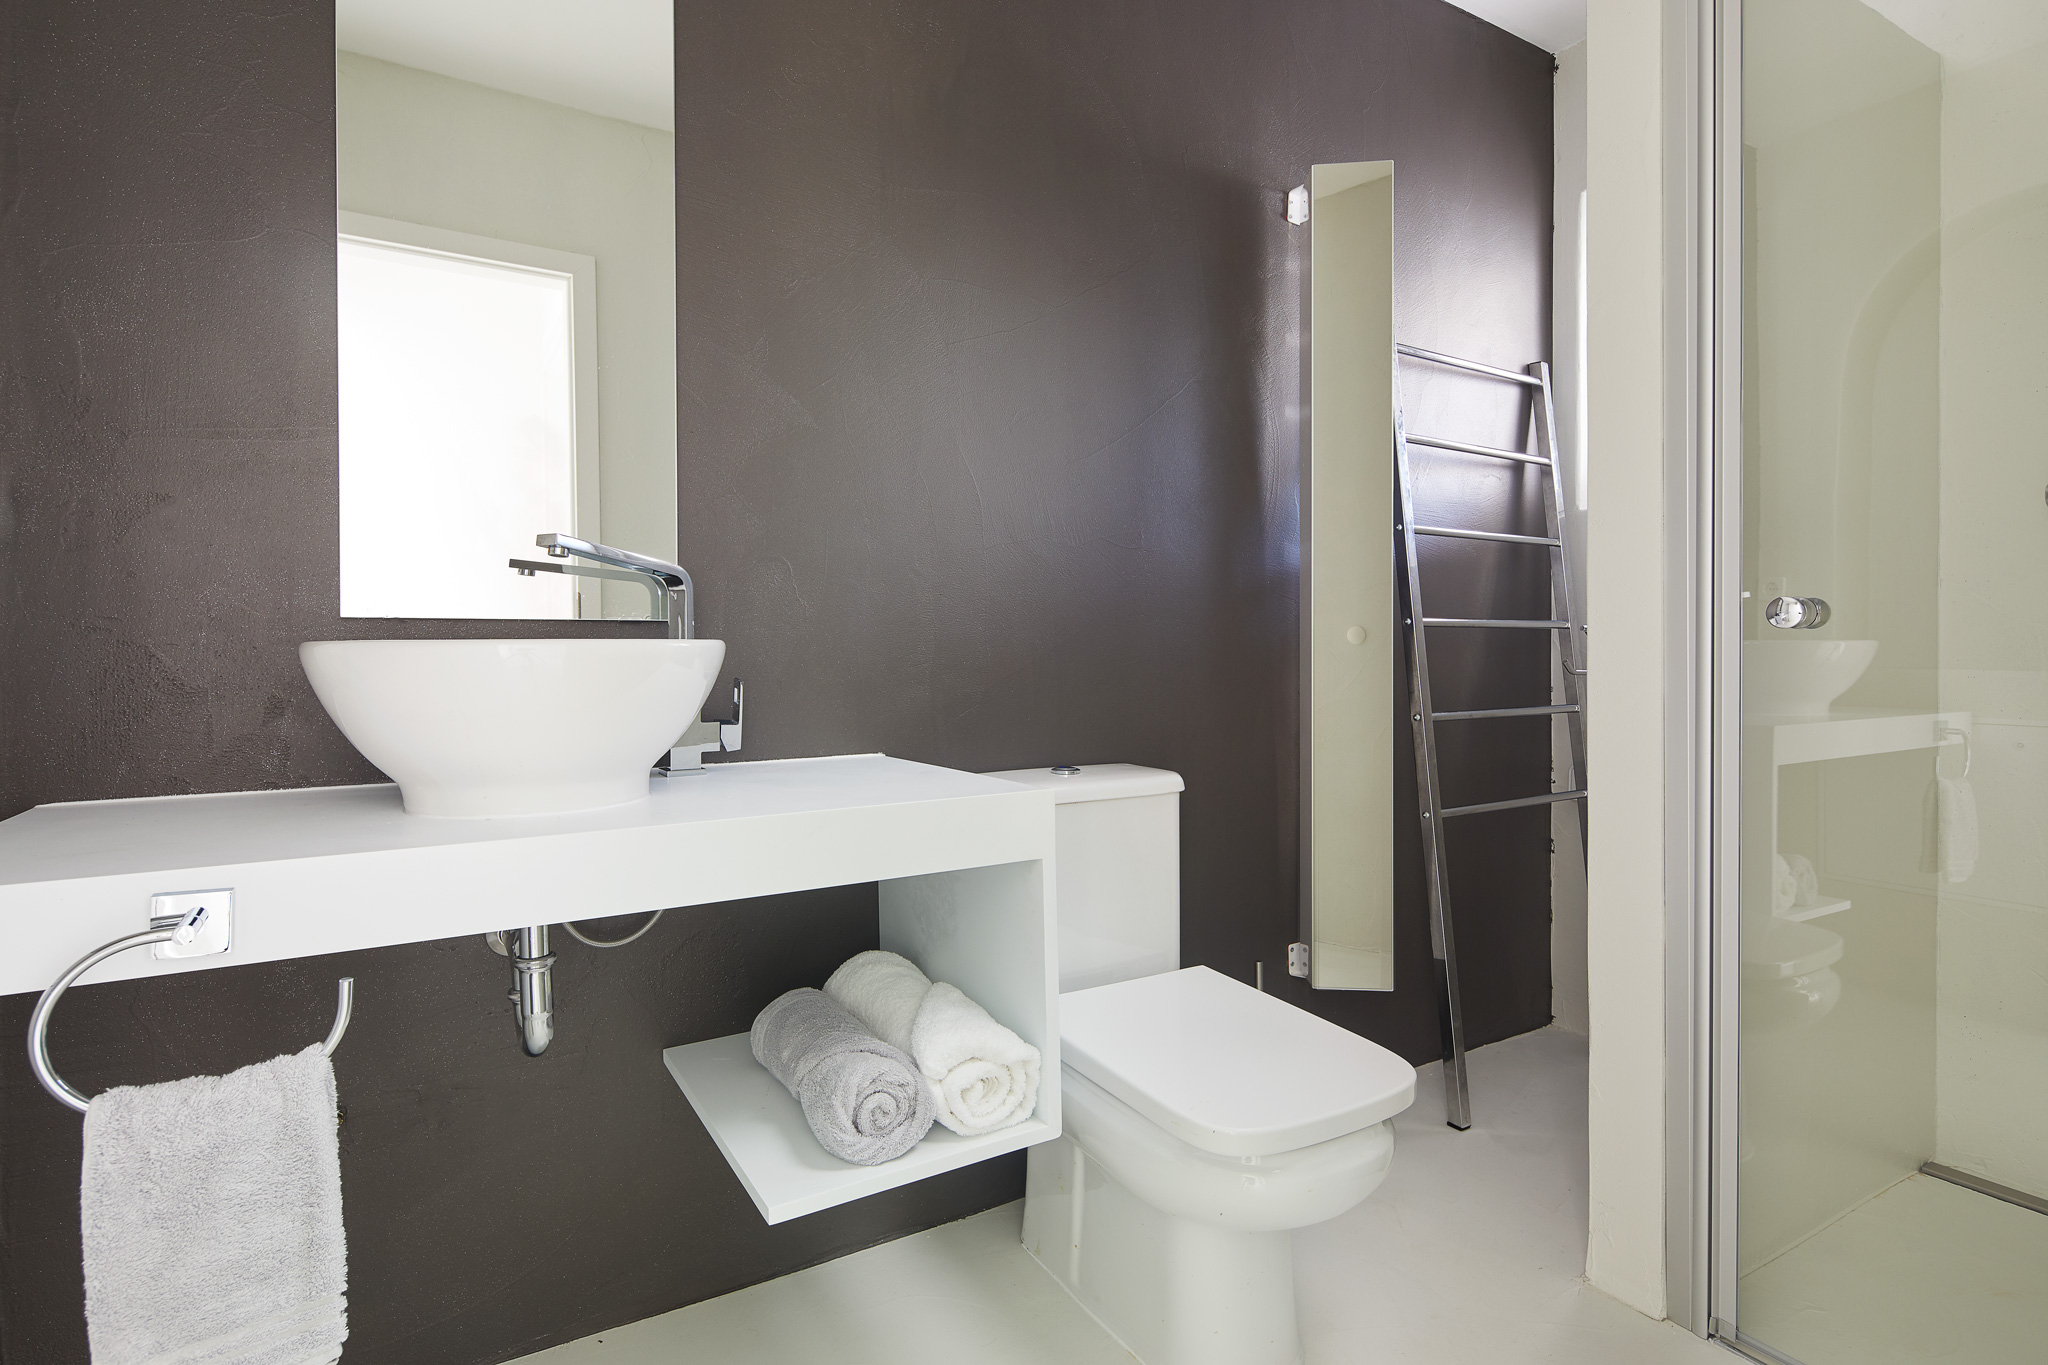 Bathroom_3.1.jpg